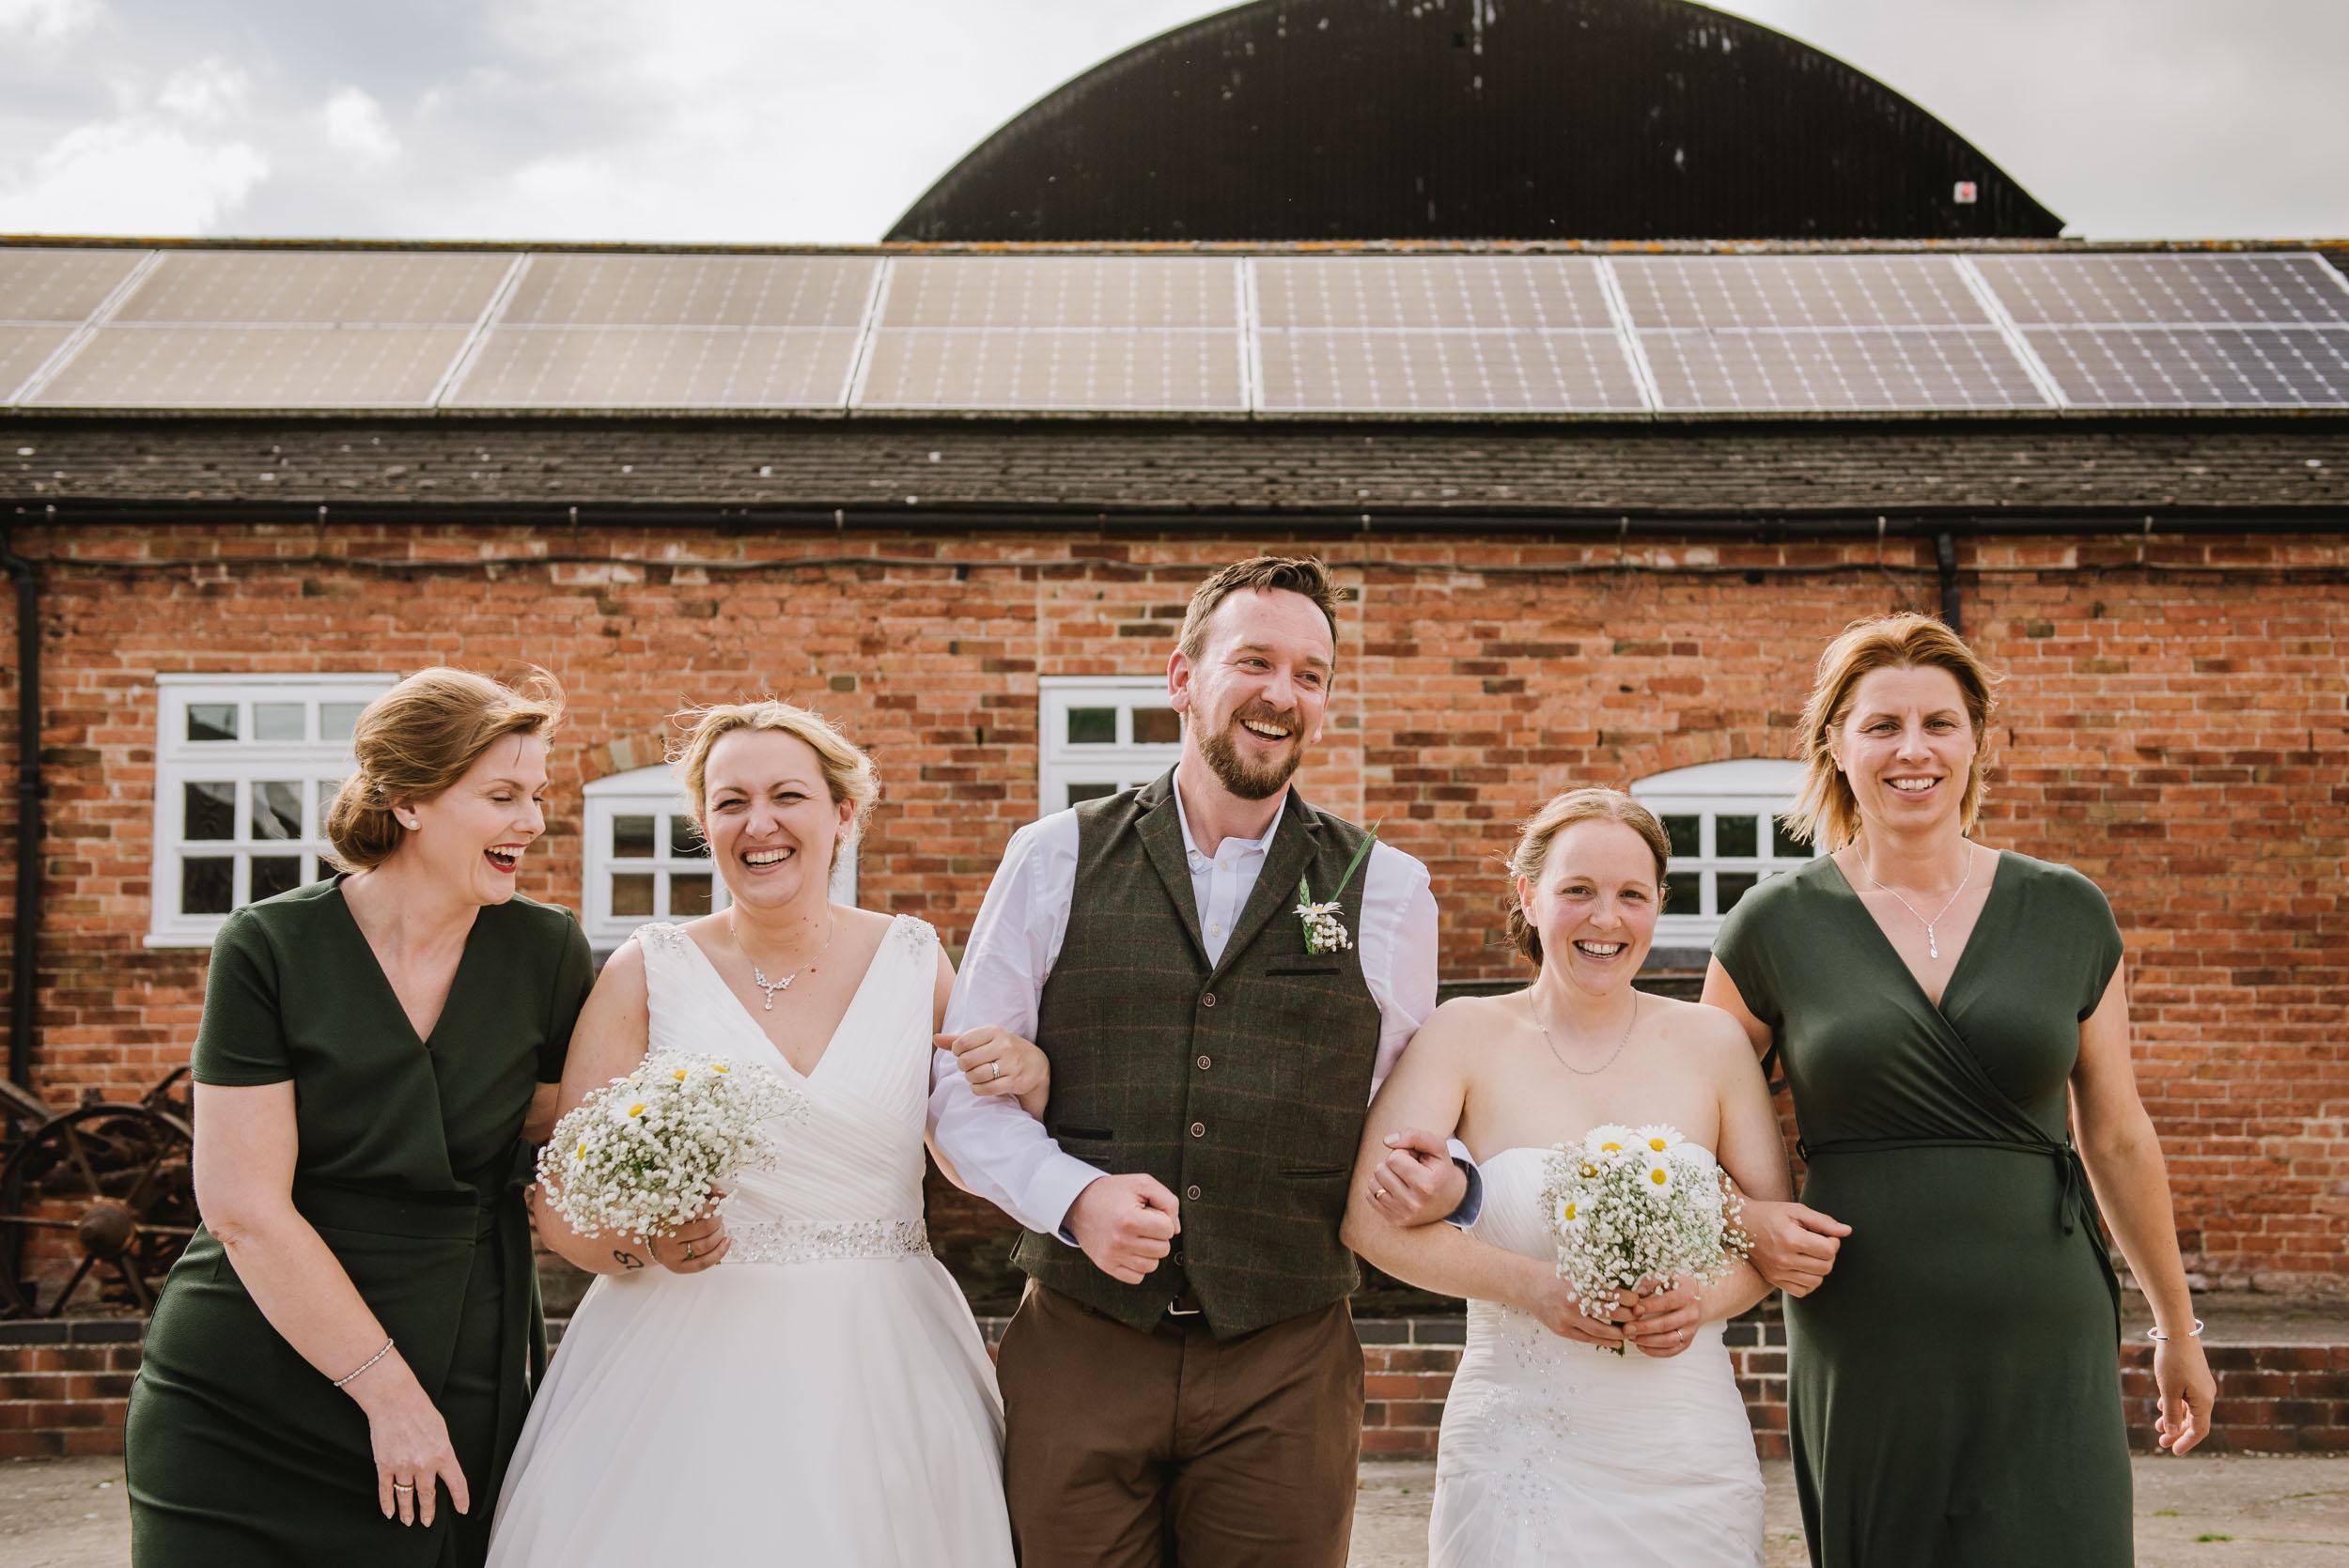 Donington-park-farm-wedding-photography-324.jpg